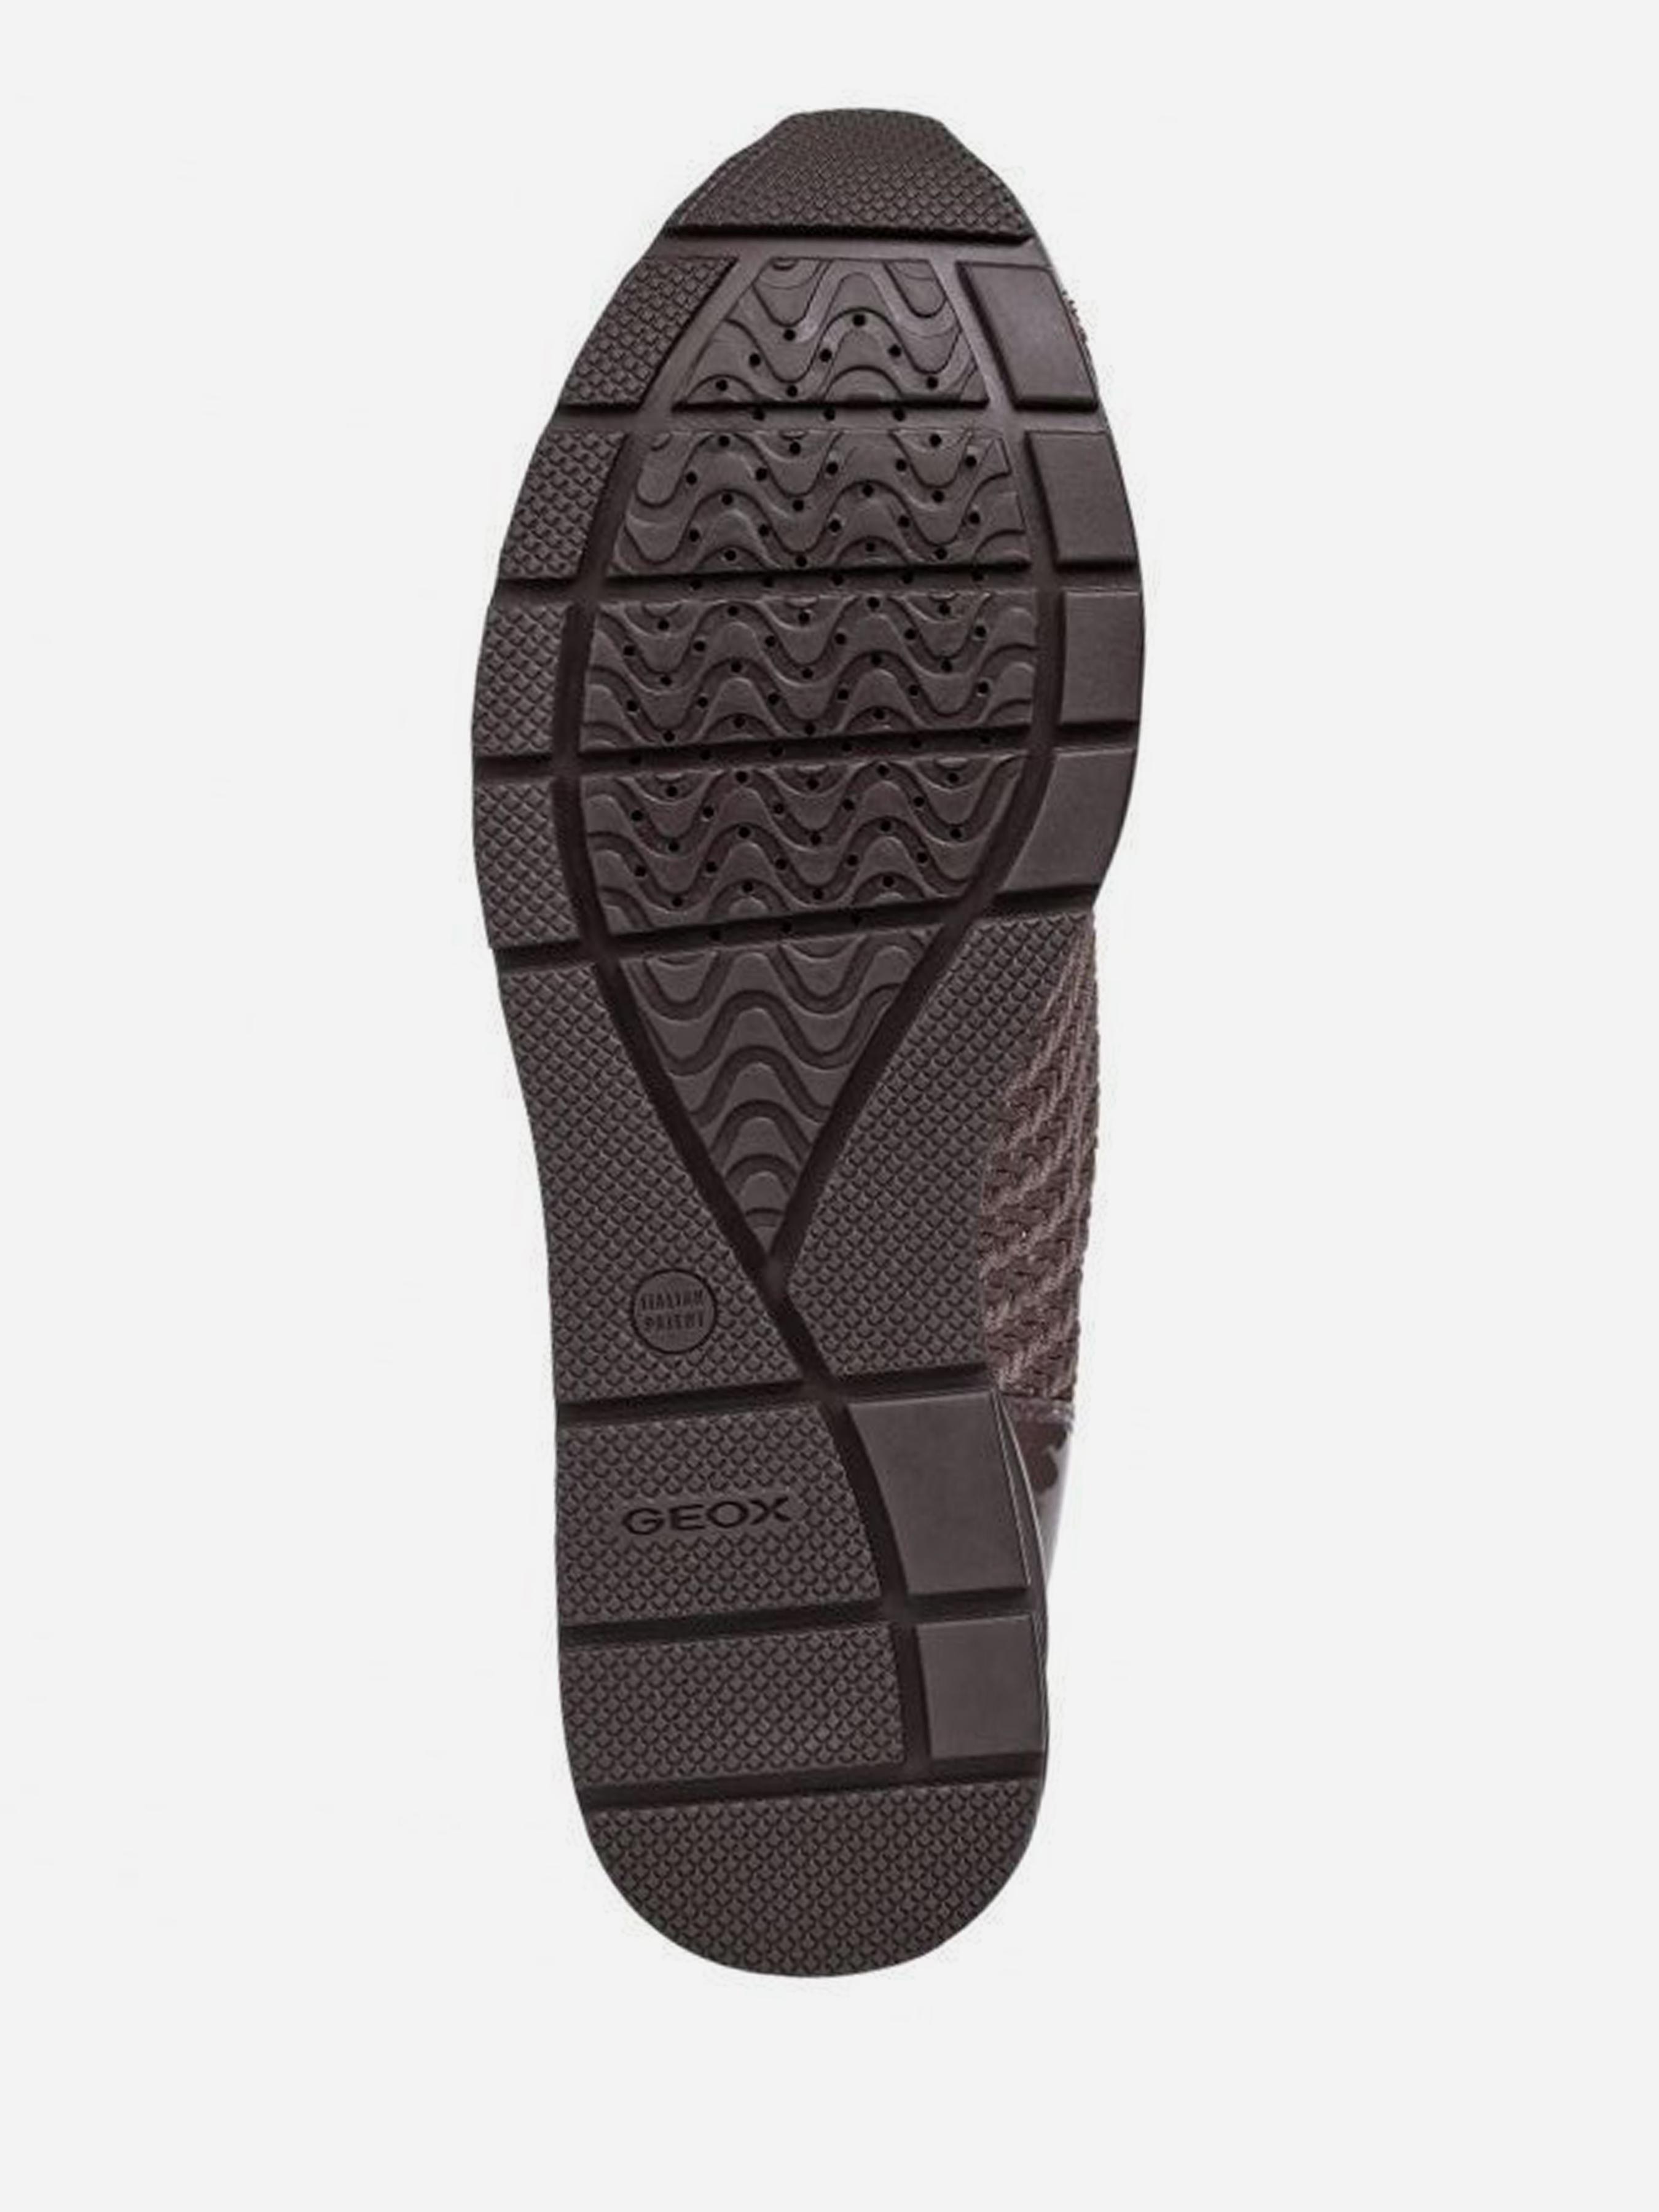 Ботинки для женщин Geox ZOSMA XW3364 модная обувь, 2017